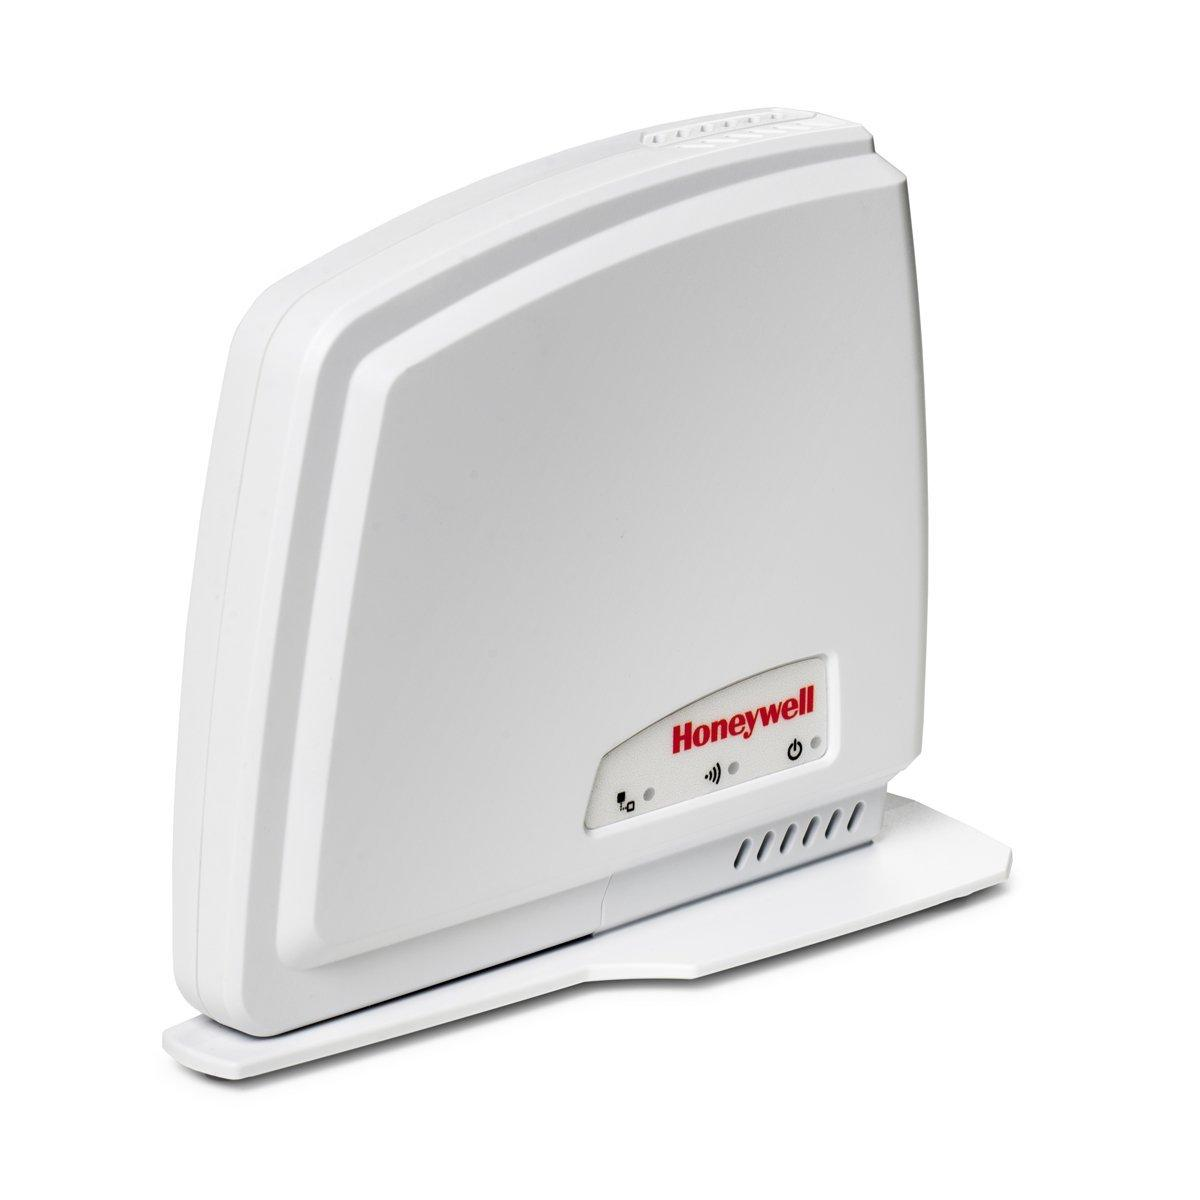 кит Honeywell WiFi gateway с термостат